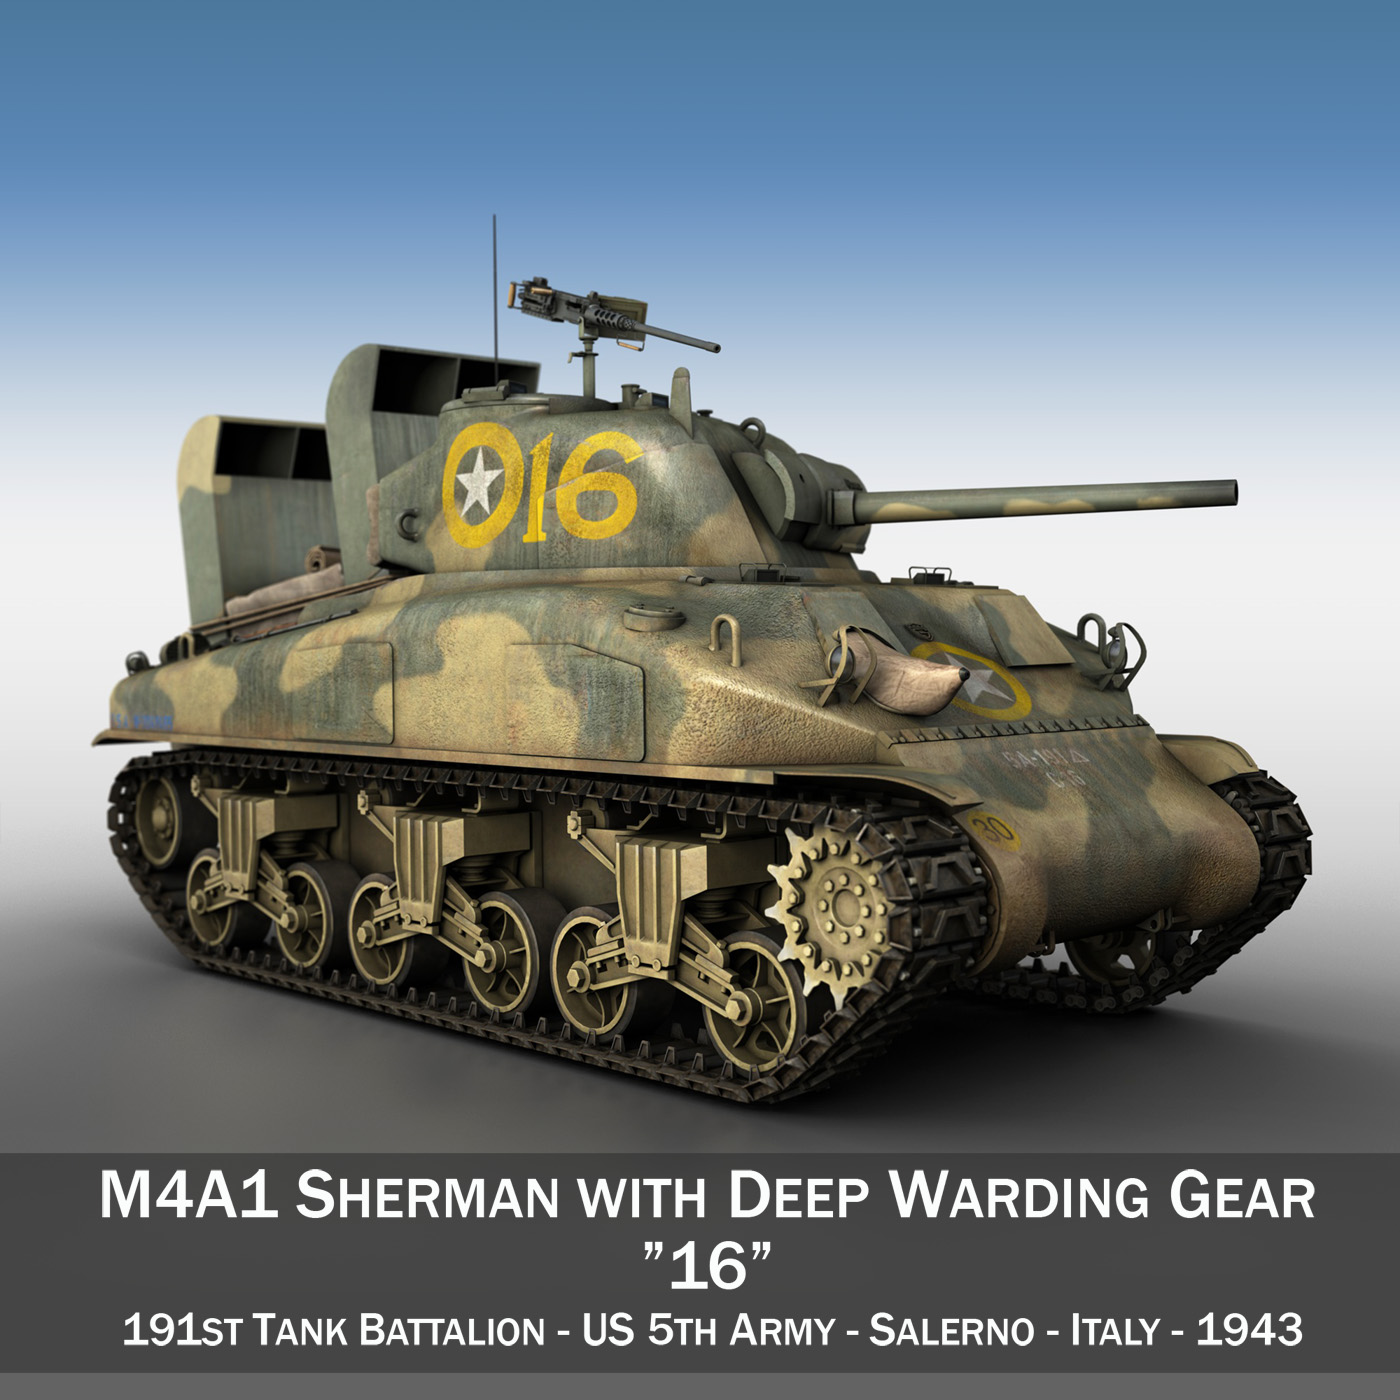 M4A1 Sherman - 16 3d model 3ds fbx c4d lwo lws lw obj 273050